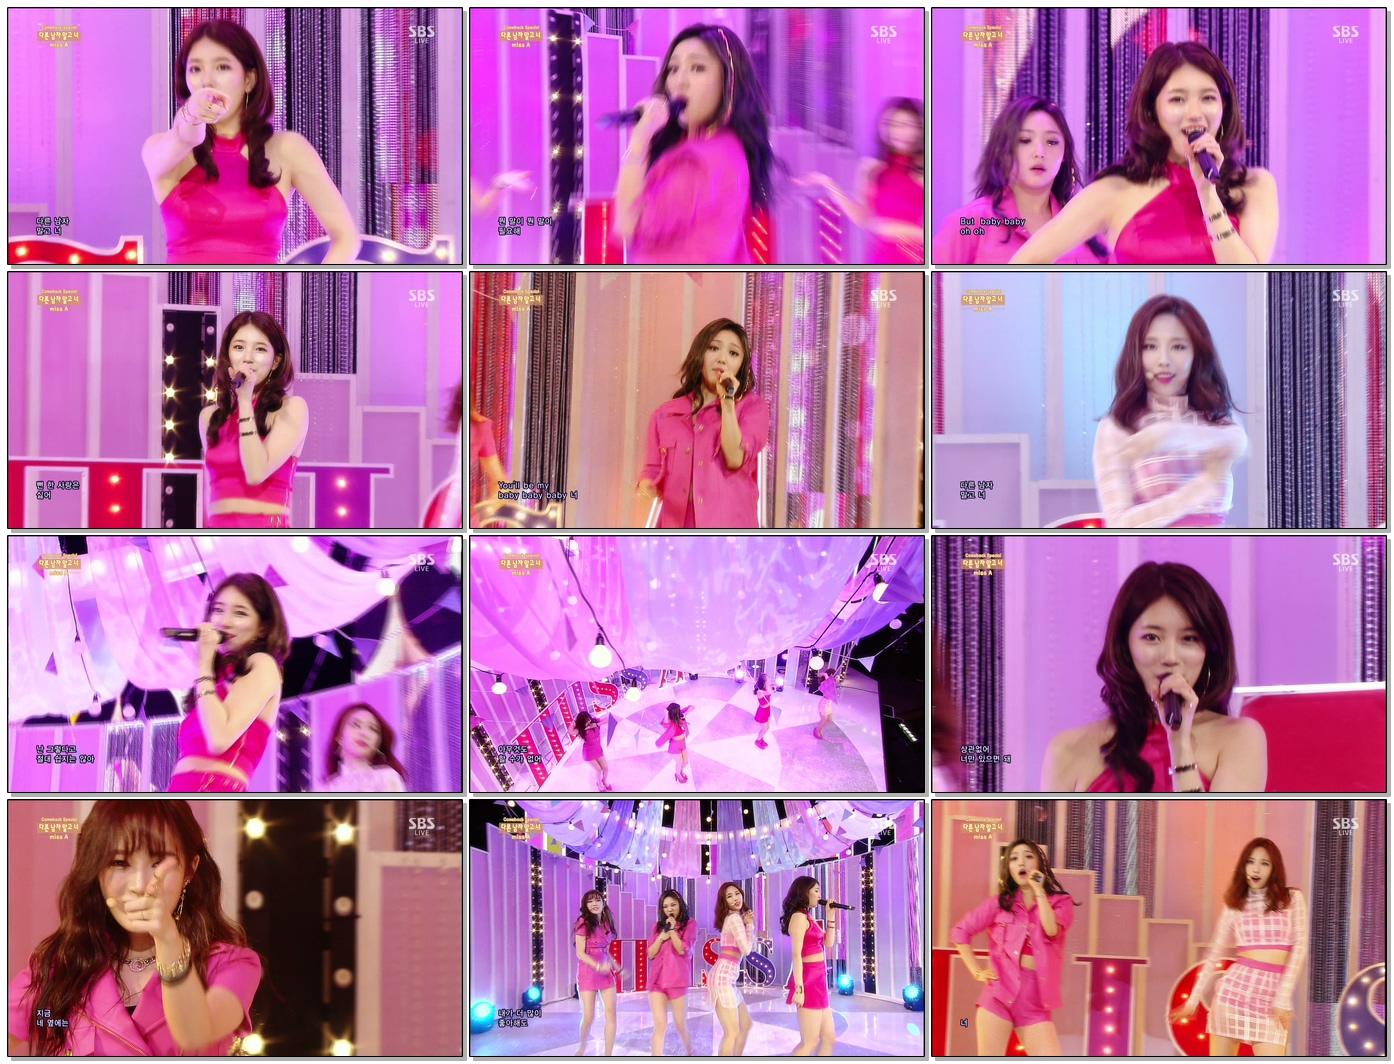 20170911.0938.10 miss A - Only You (Inkigayo 2015.04.05 HDTV) (JPOP.ru).ts.jpg